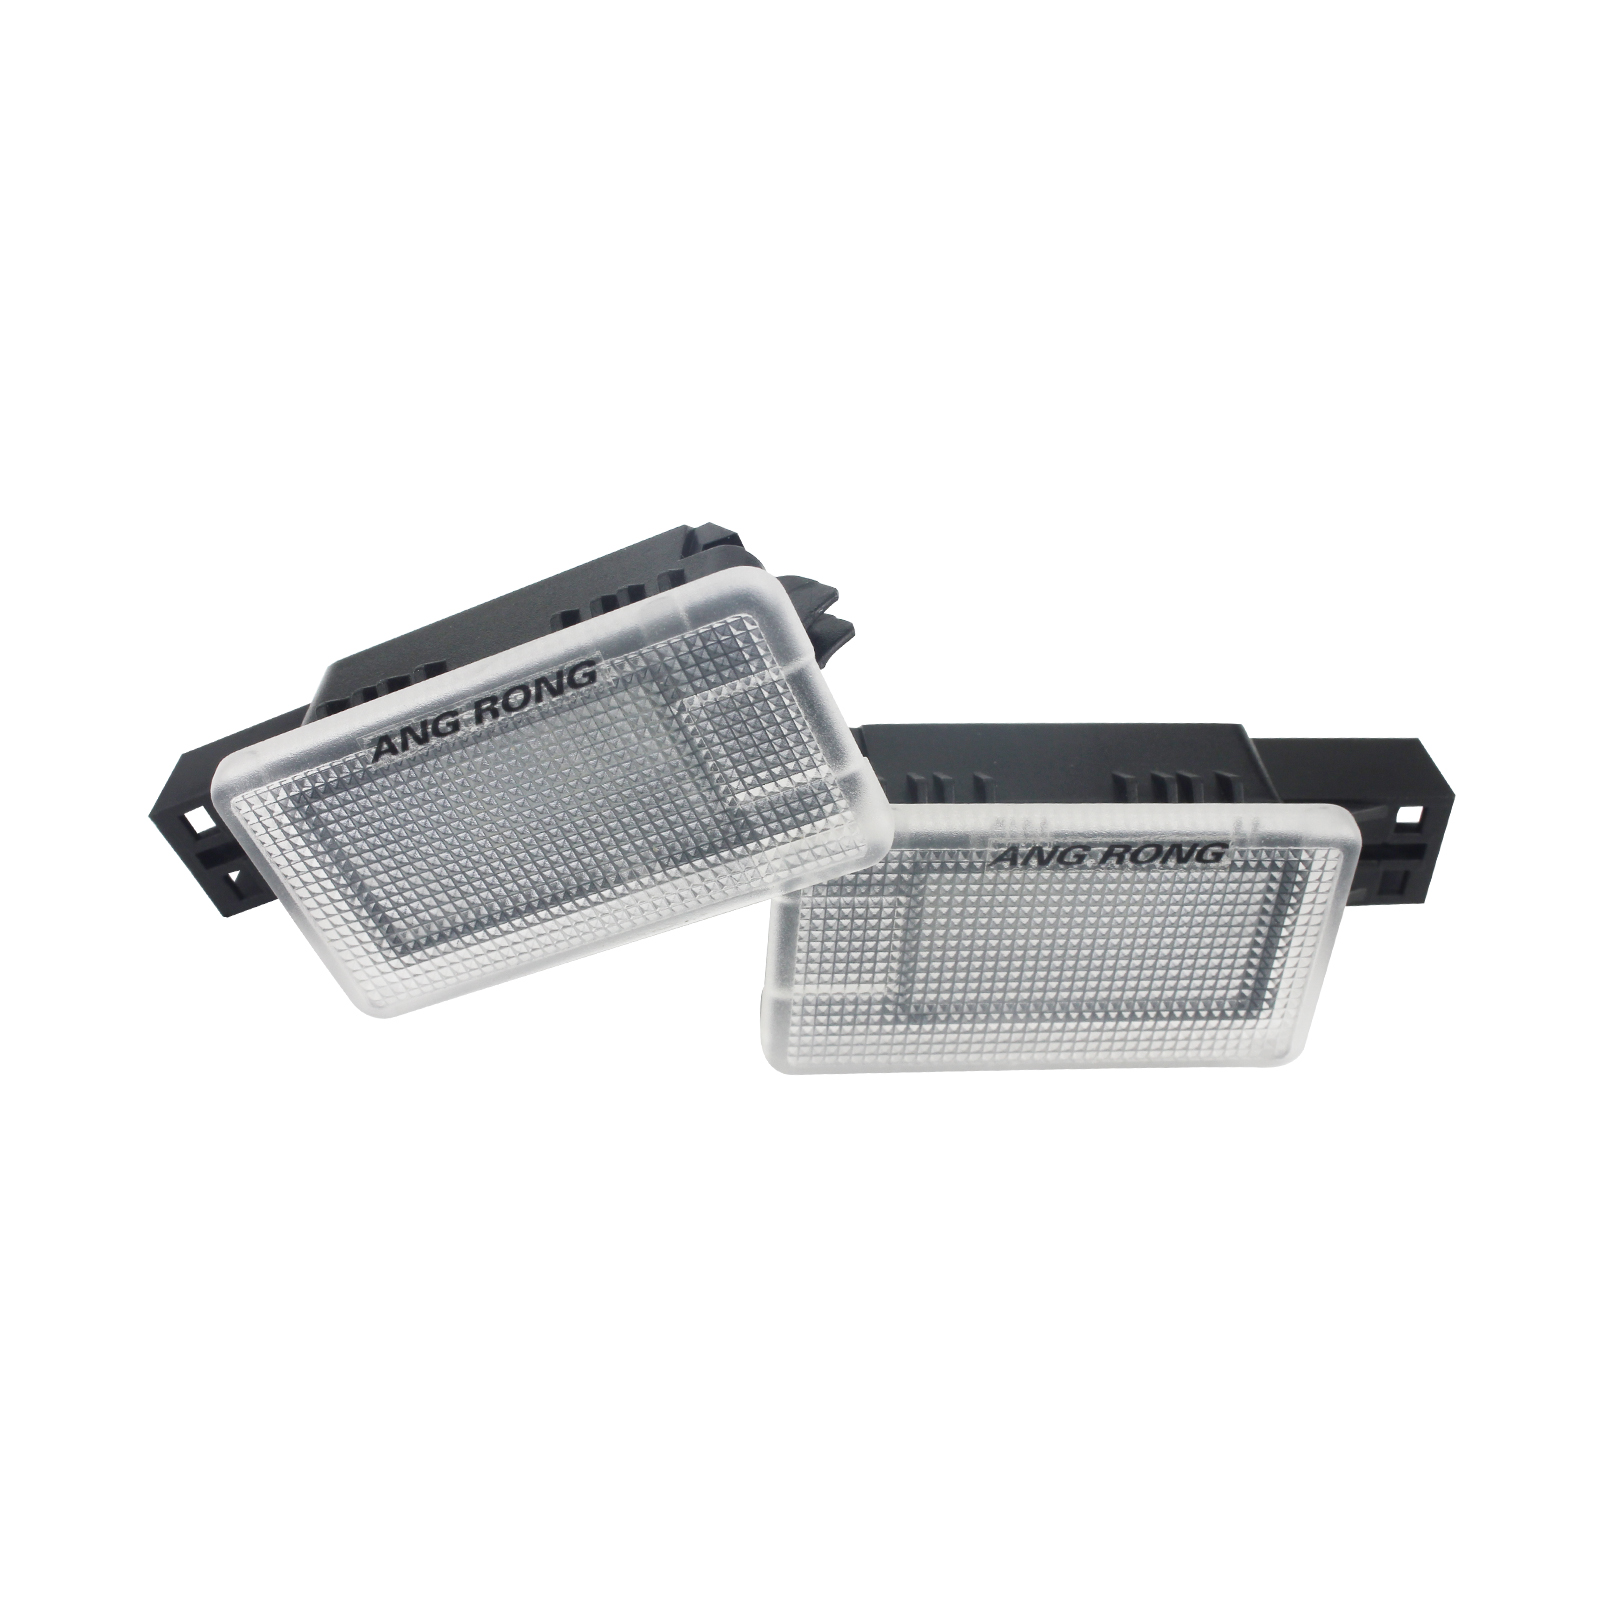 ANGRONG 2x LED Footwell вежливая дверь боковой свет для Volvo V70 XC70 XC60 V60 V40 S60 S80 белый